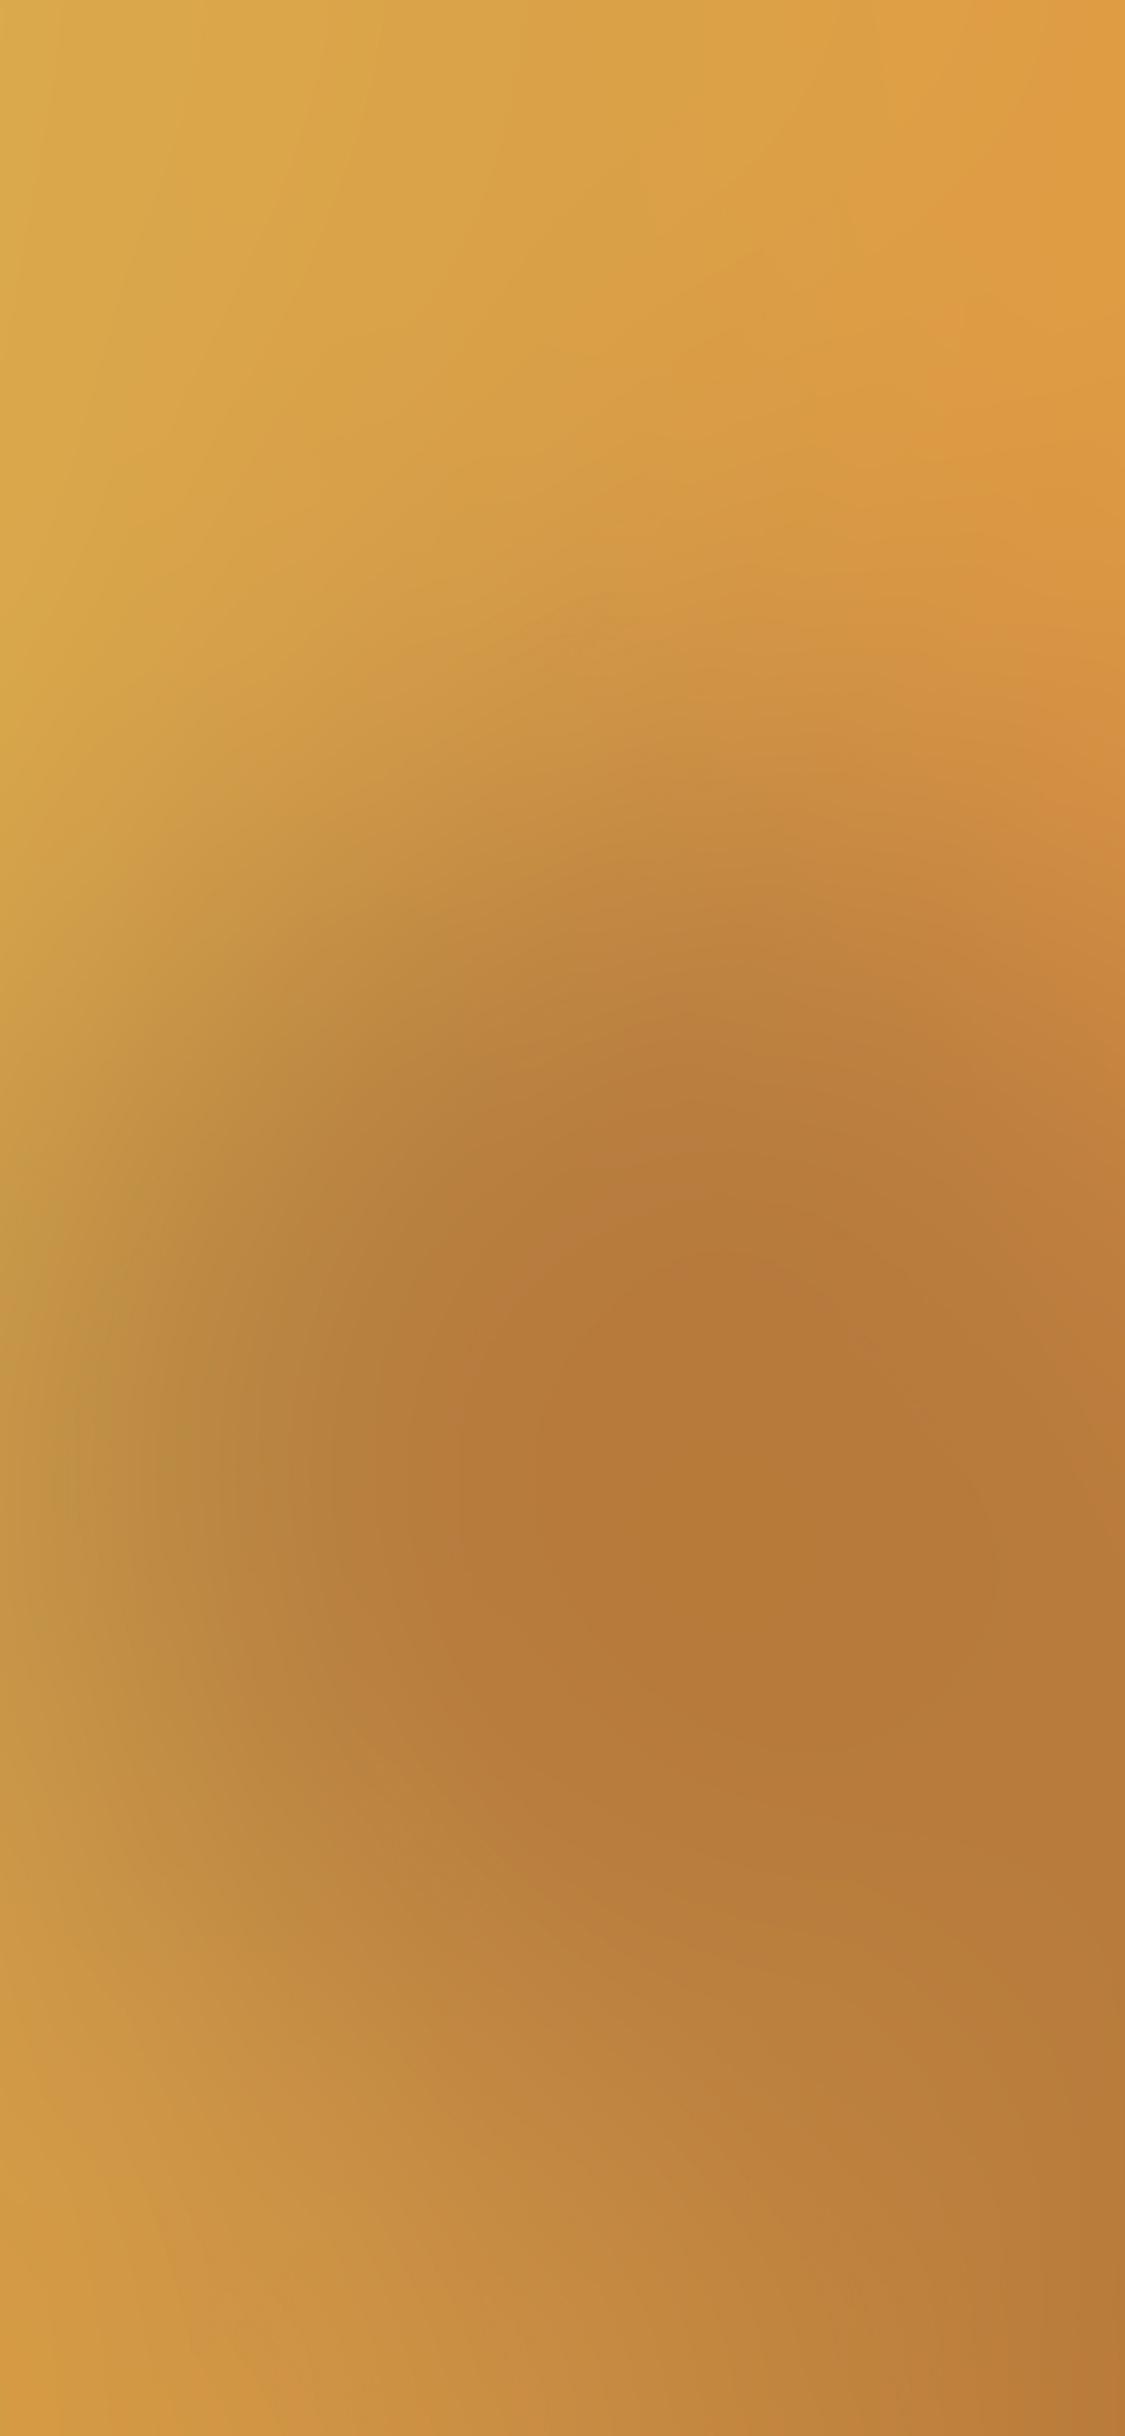 iPhoneXpapers.com-Apple-iPhone-wallpaper-sc32-just-orange-orange-and-some-gold